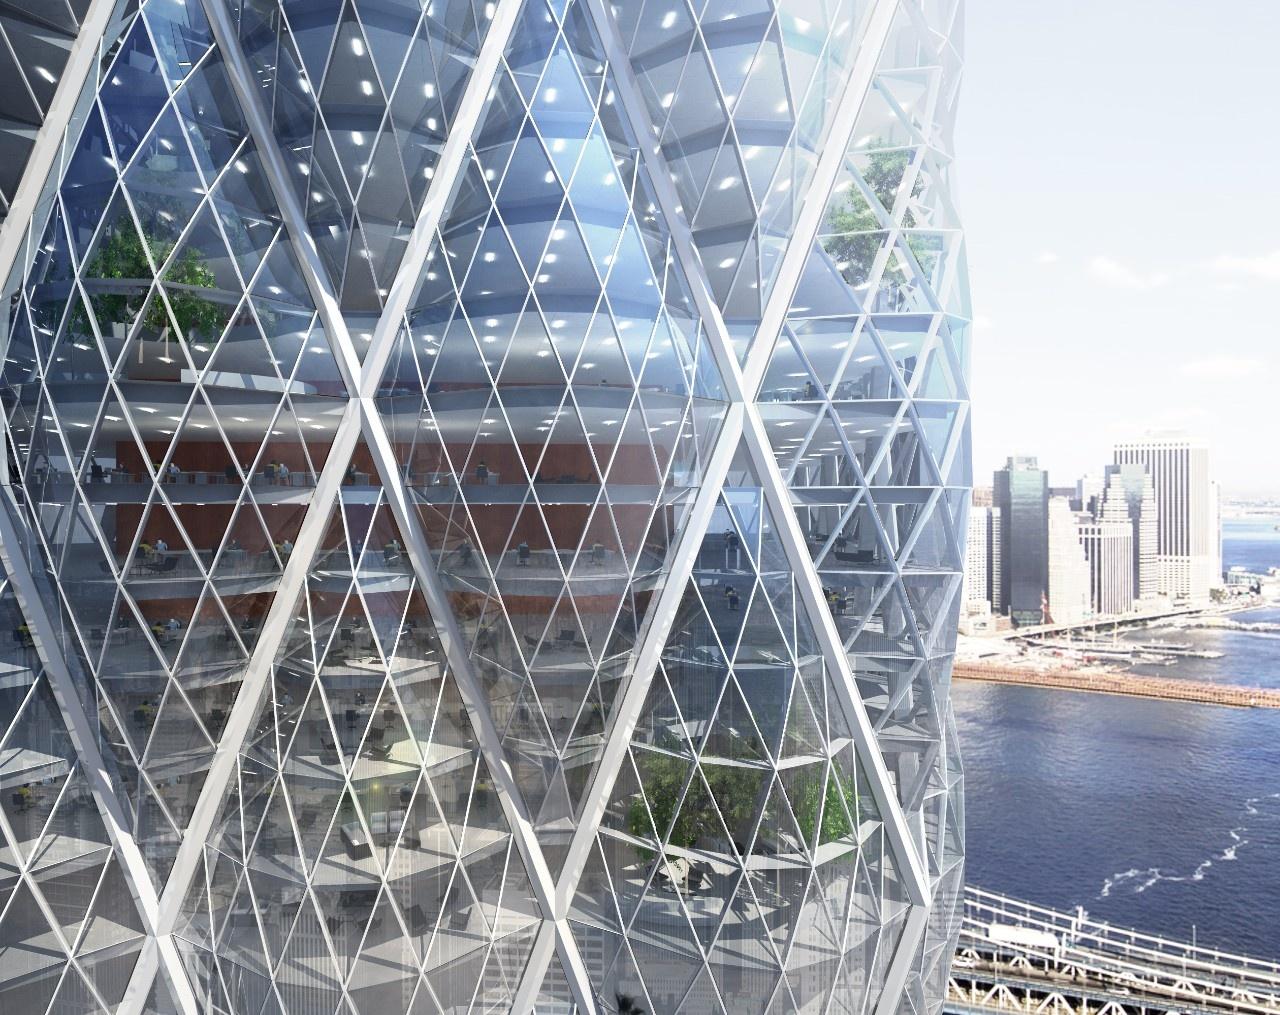 Architect Designs inspiredgolf ball, architect designs stiffer, greener